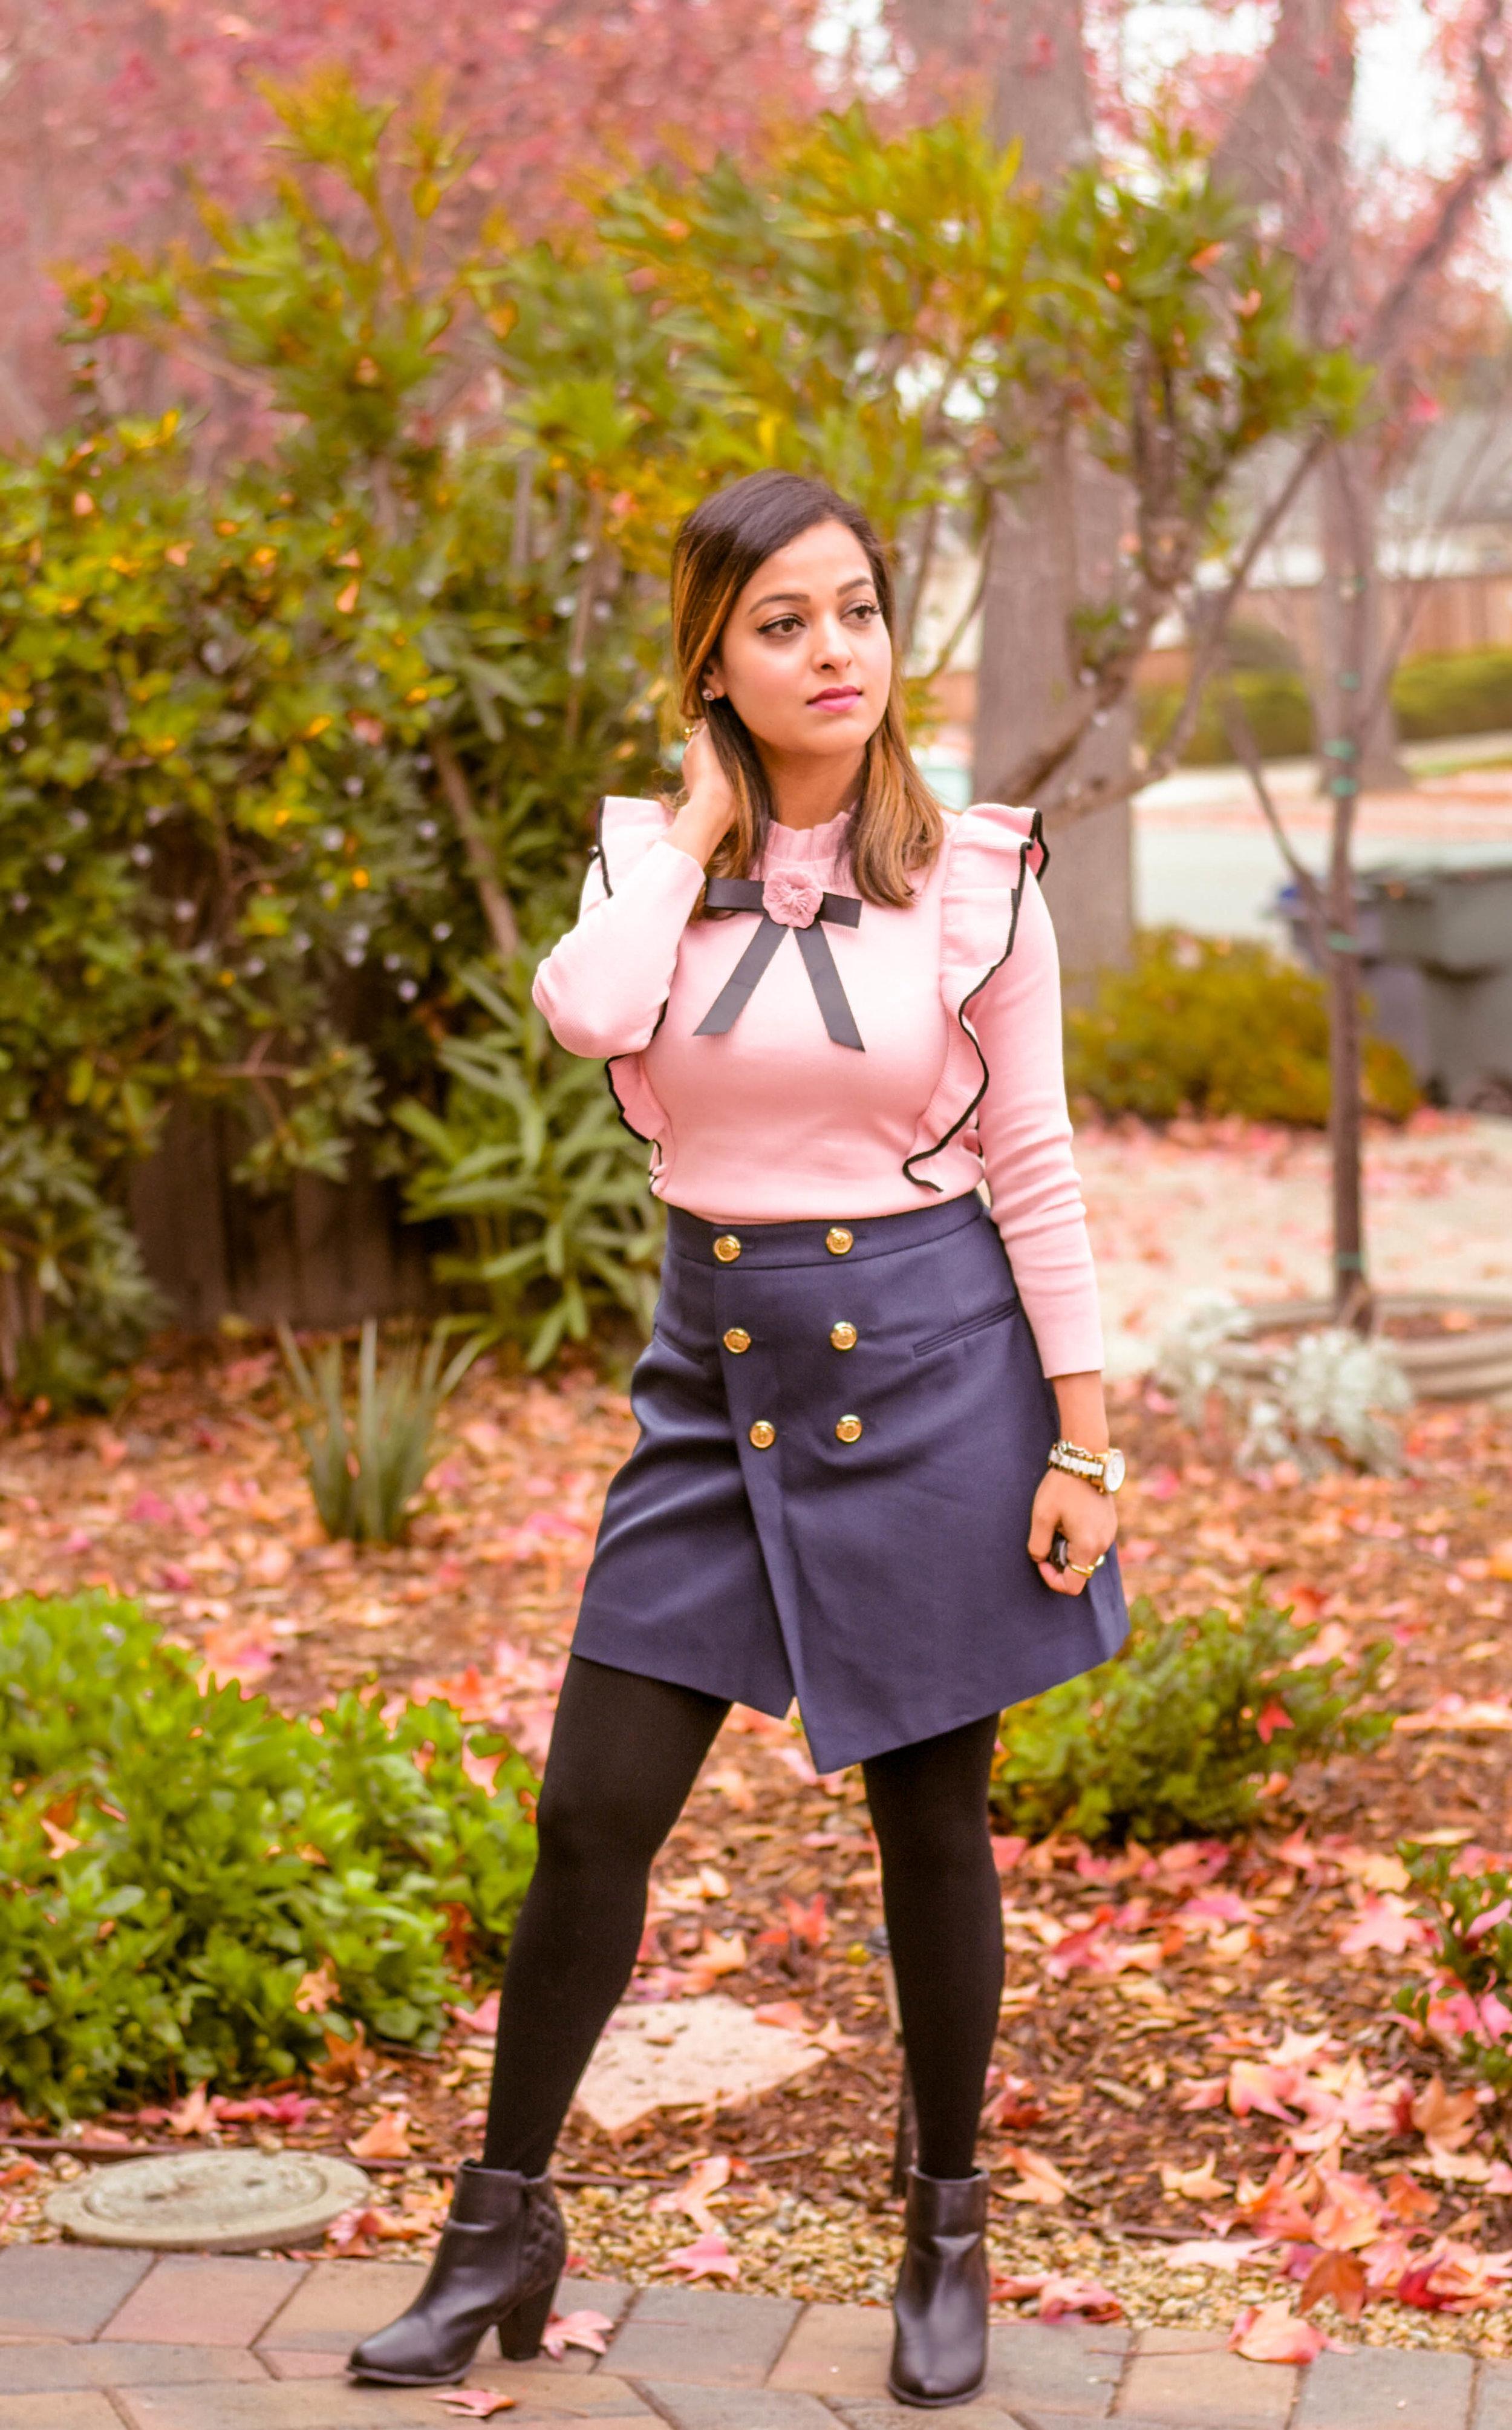 Top Shein    Skirt ASOS    Shoes- Aldo